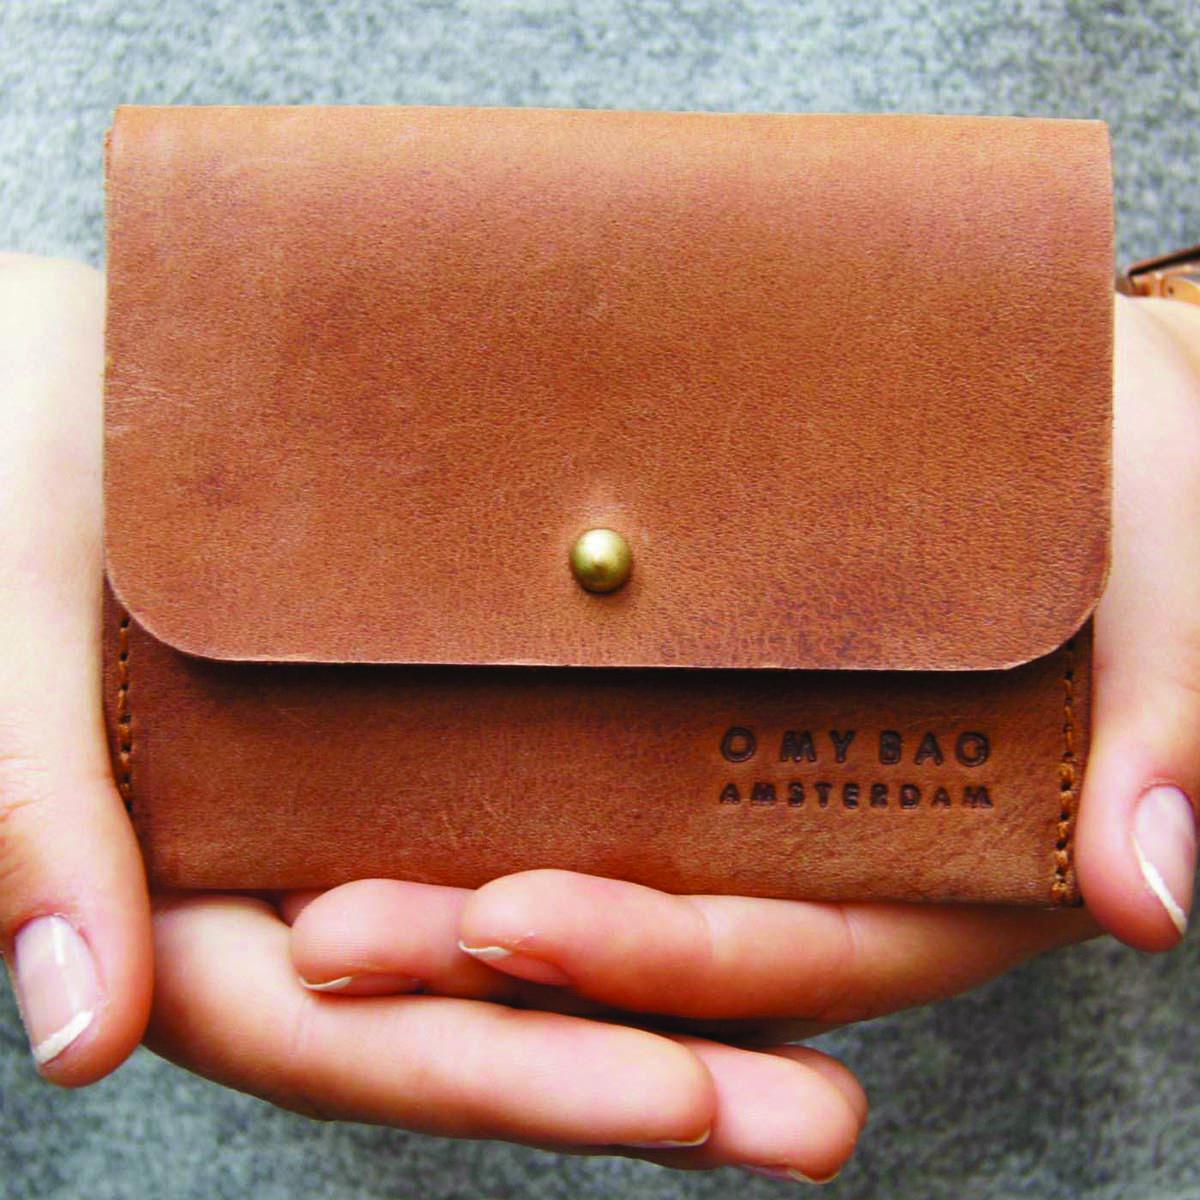 O My Bag - Cardholder, Eco Camel